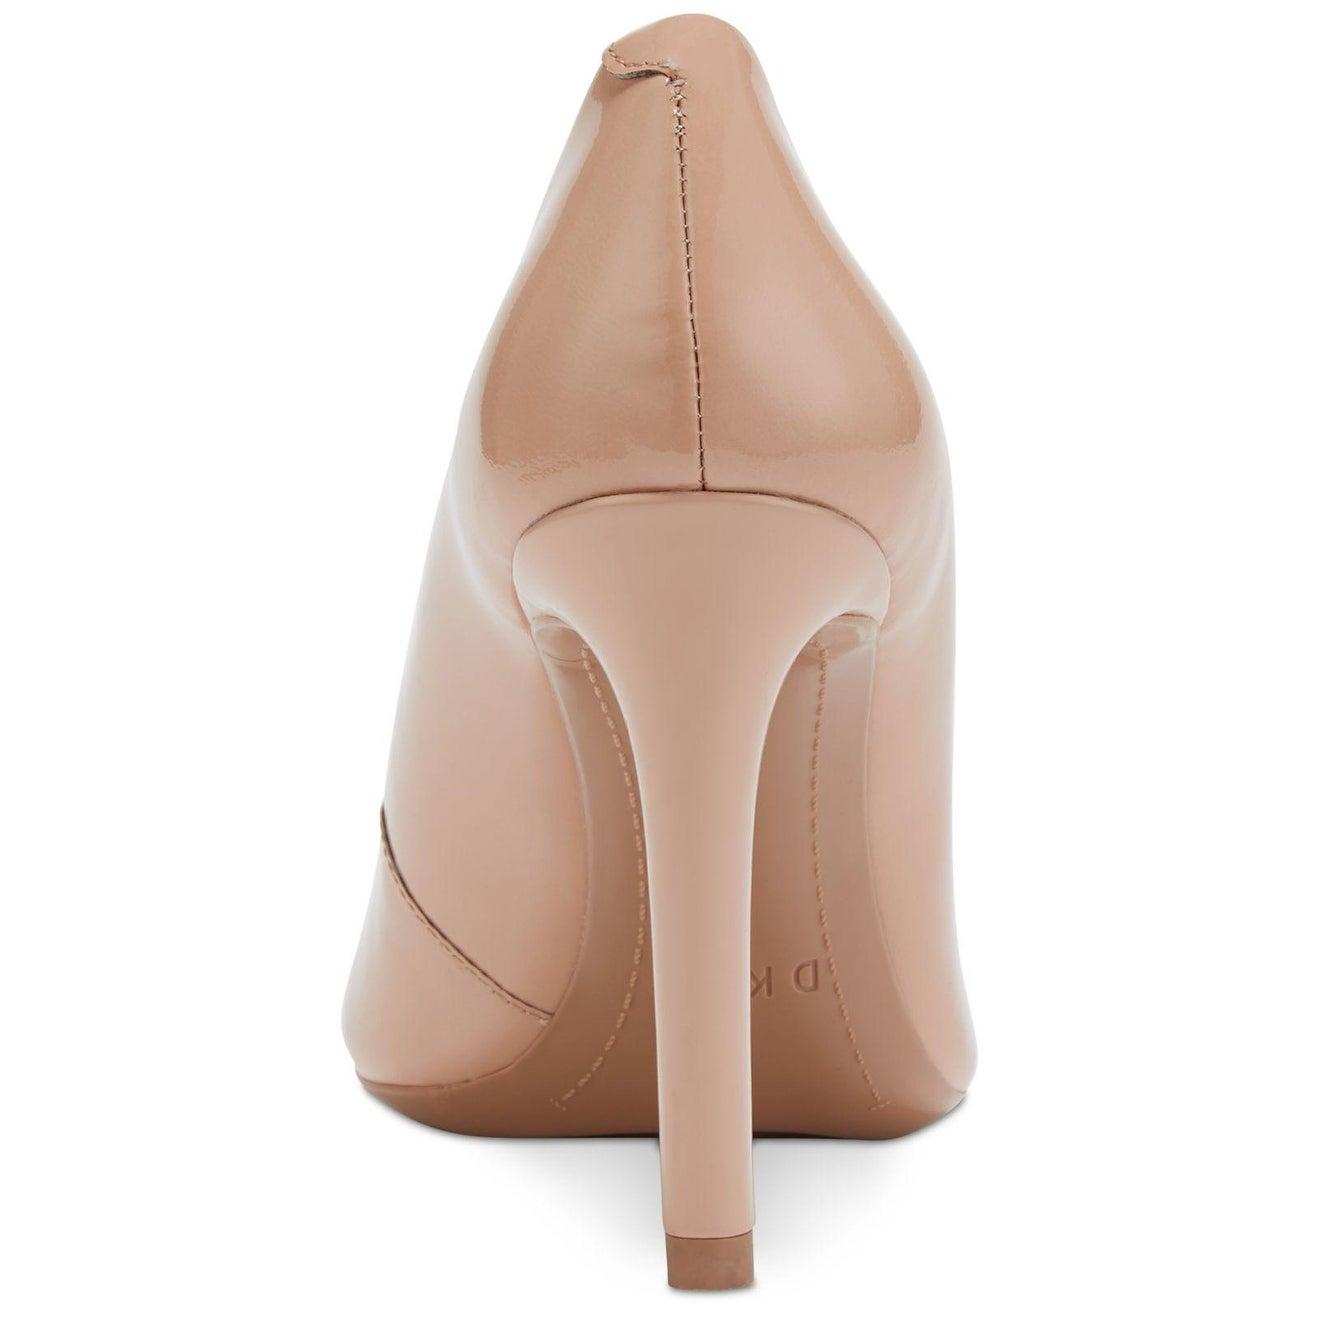 DKNY Womens Laci-Pump Leather Round Toe Classic Pump